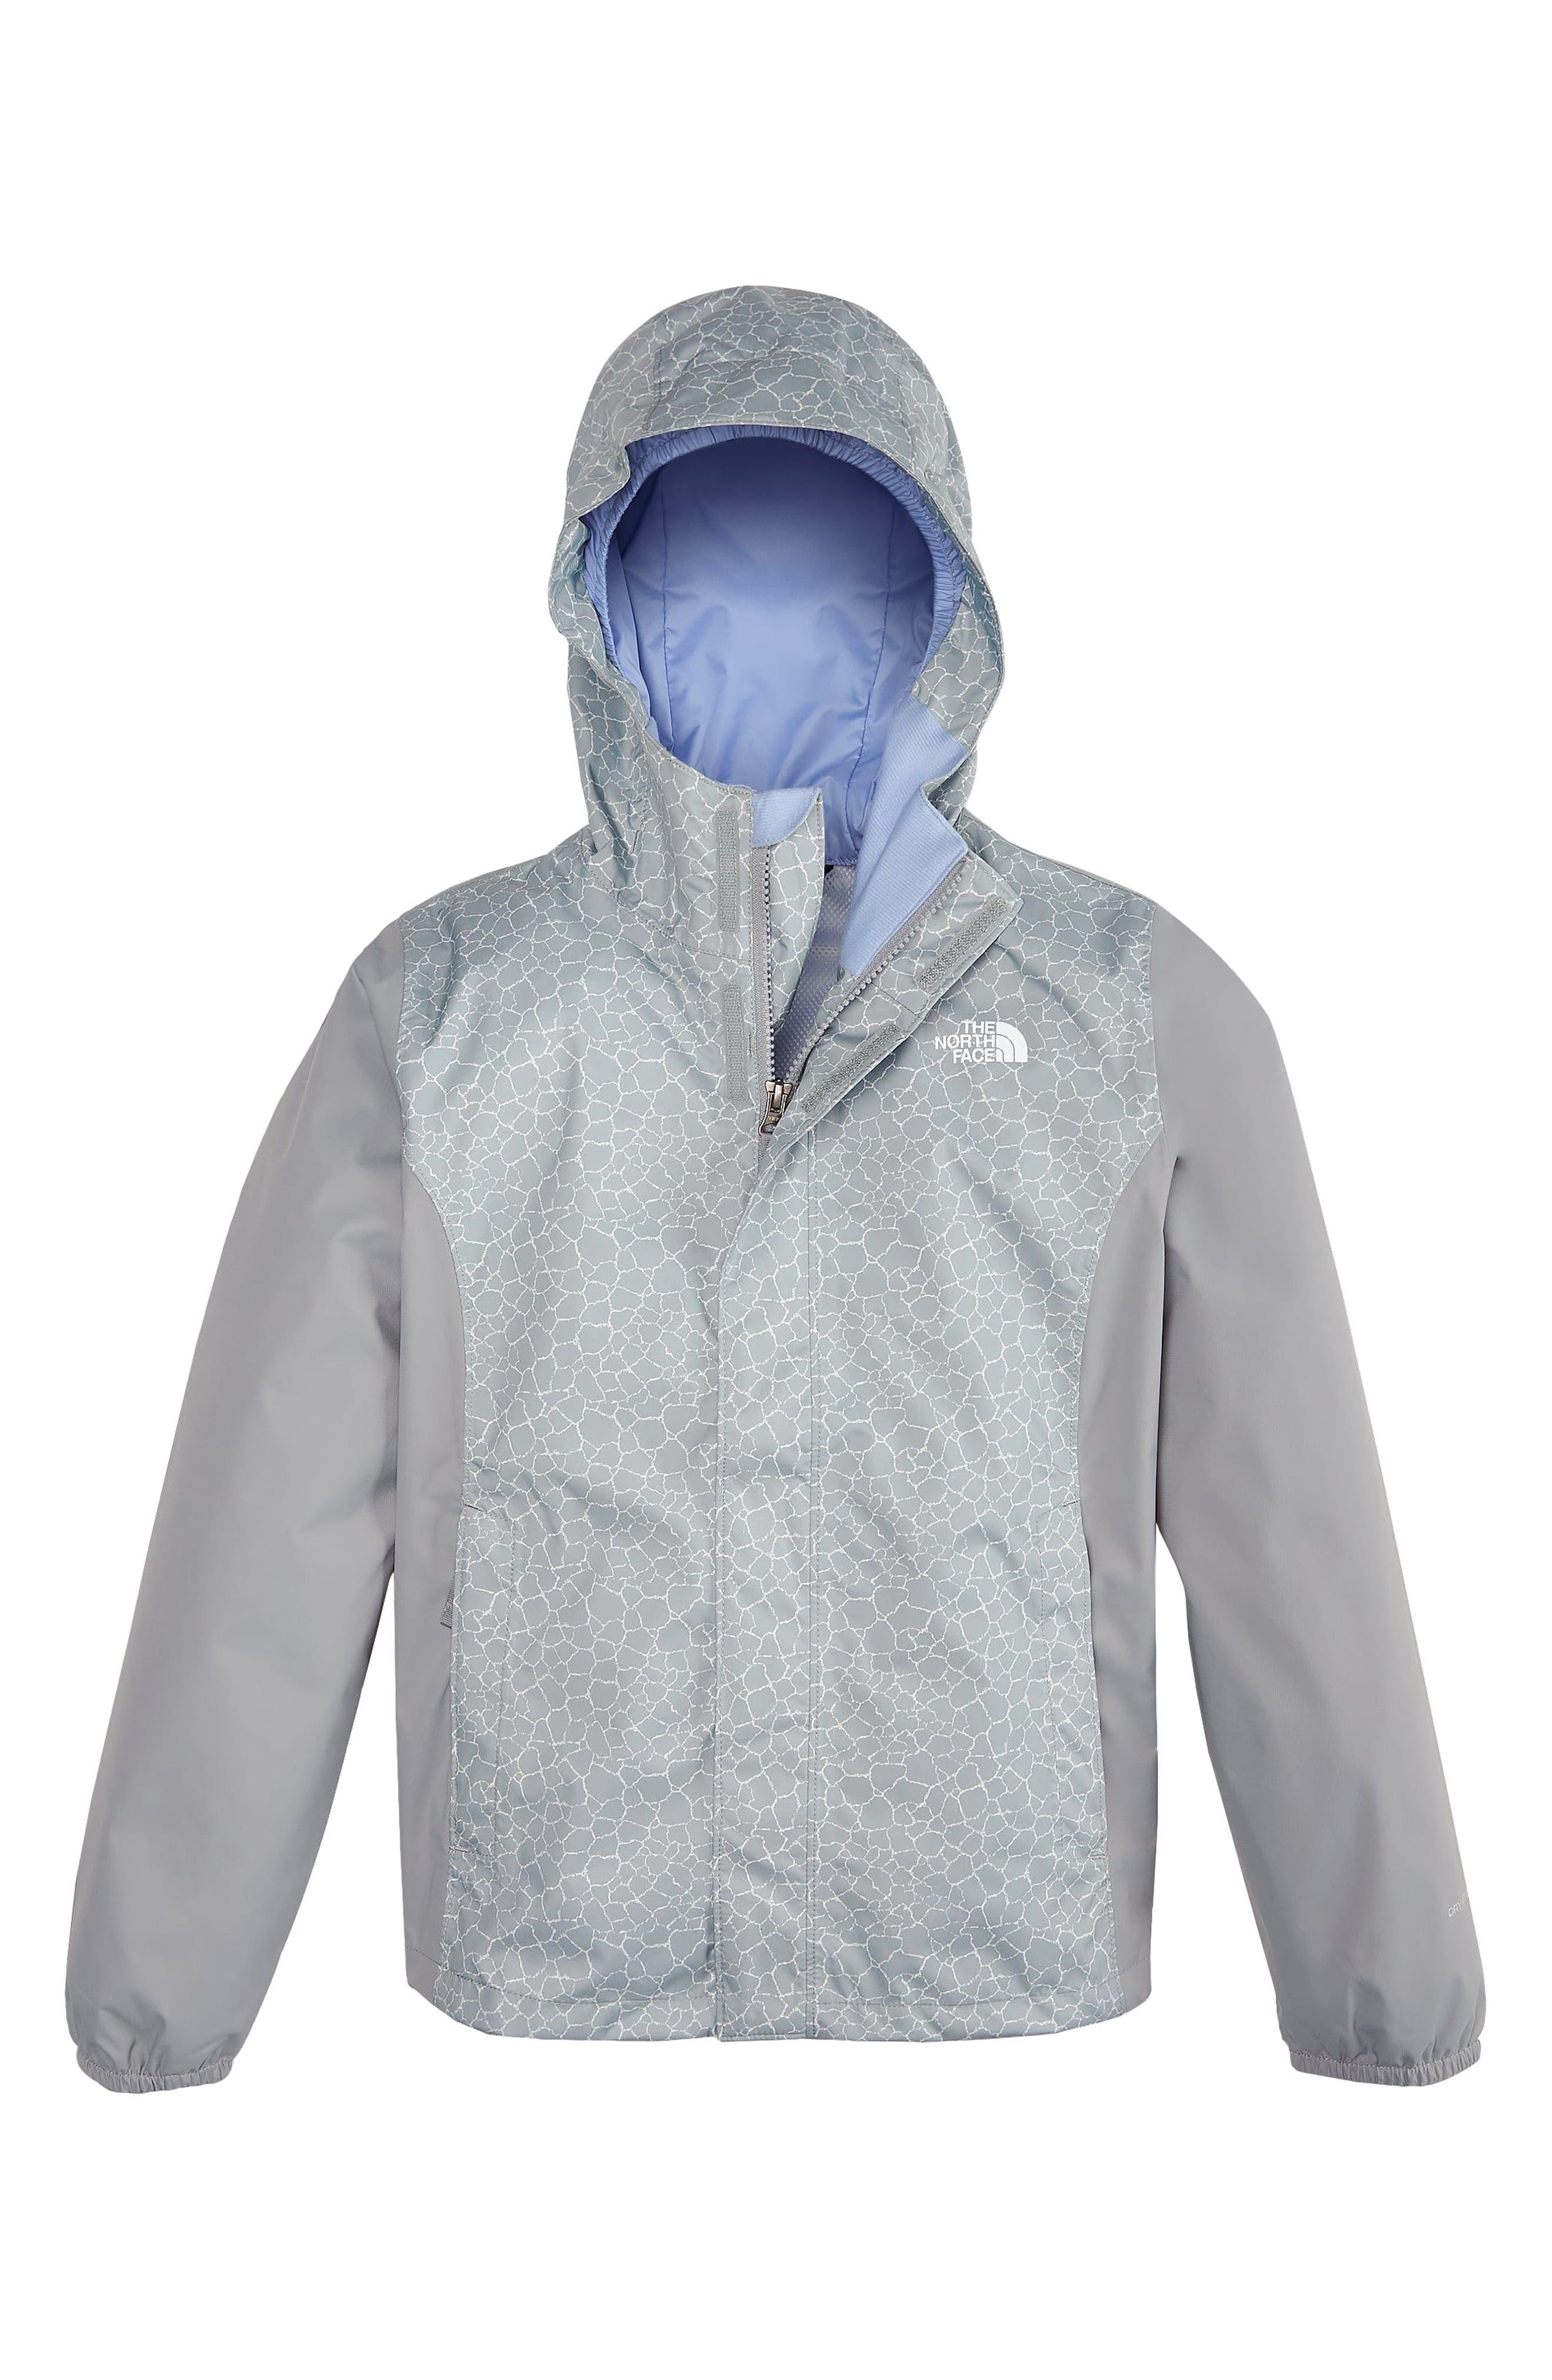 Resolve Reflective Waterproof Hooded Jacket,                             Main thumbnail 1, color,                             Mid Grey Crackle Print